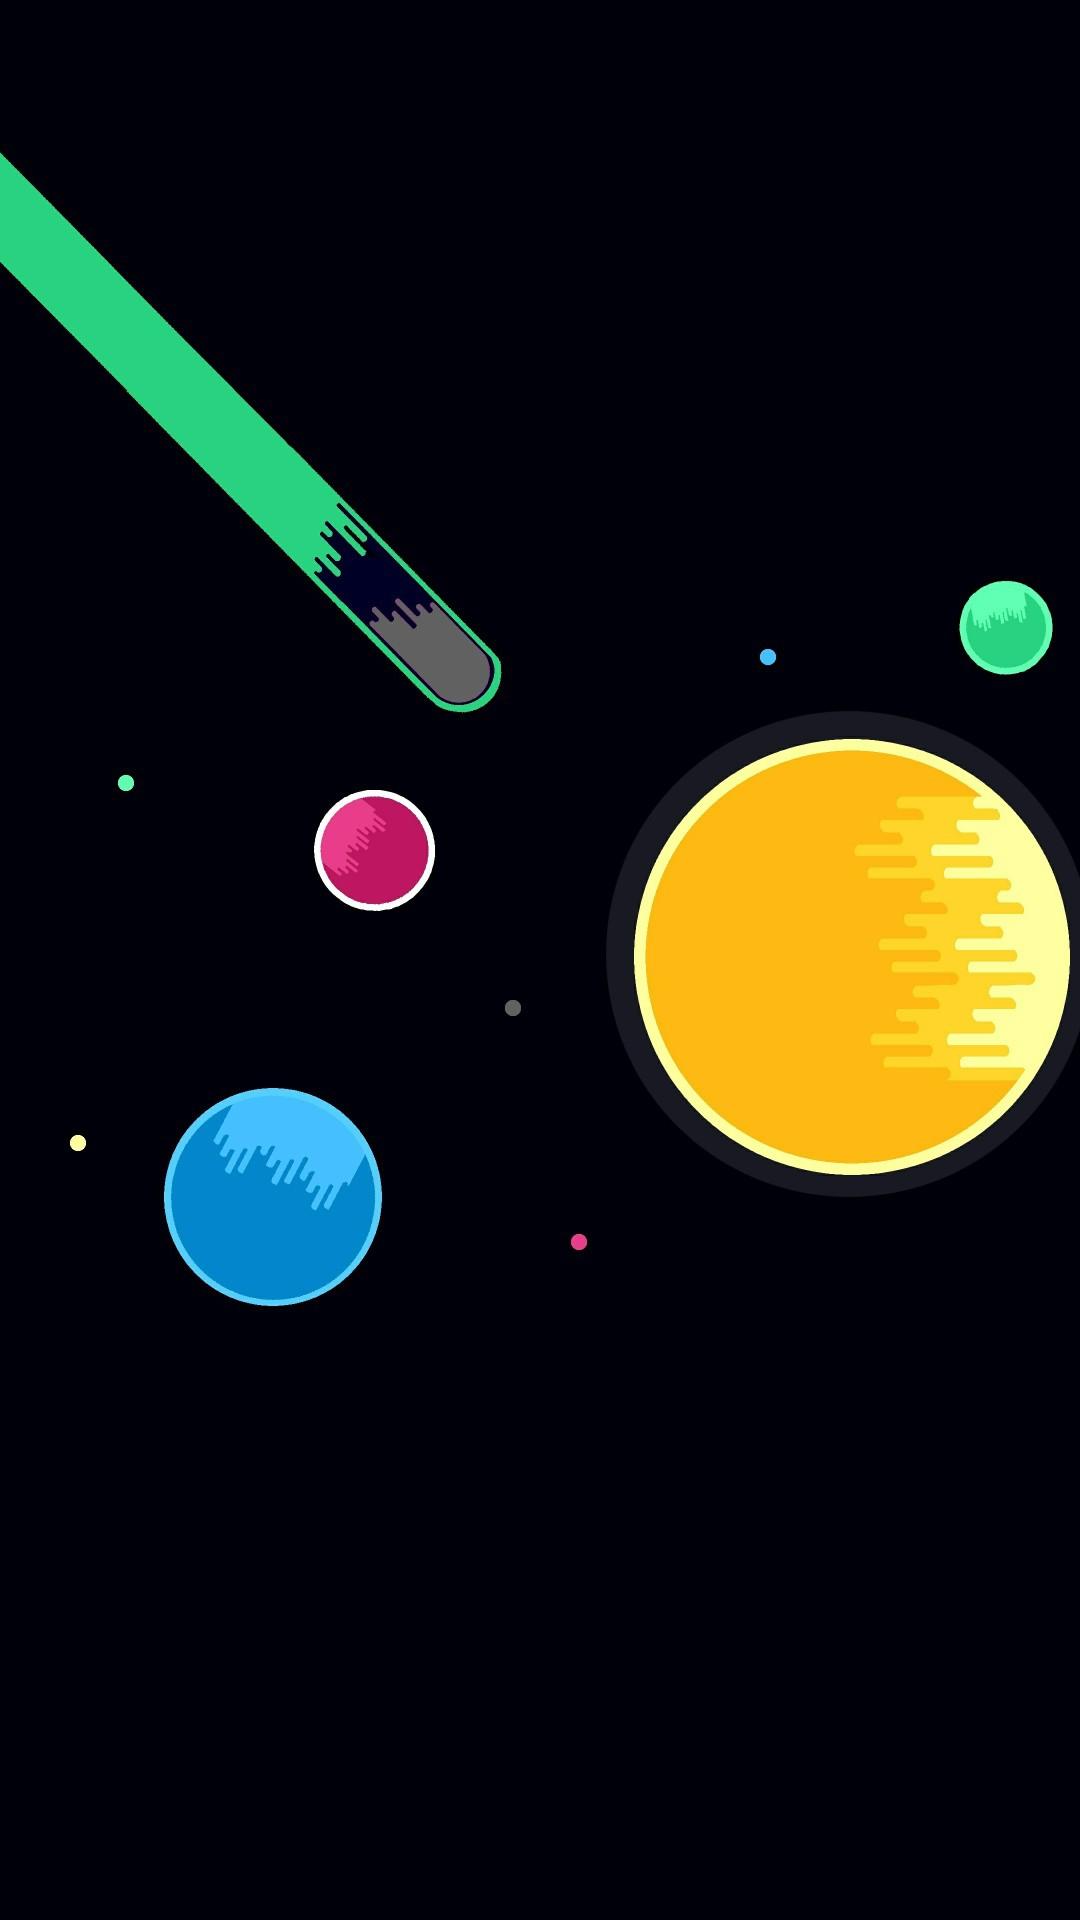 Minimal Planets Space Meteoroid iPhone Wallpaper